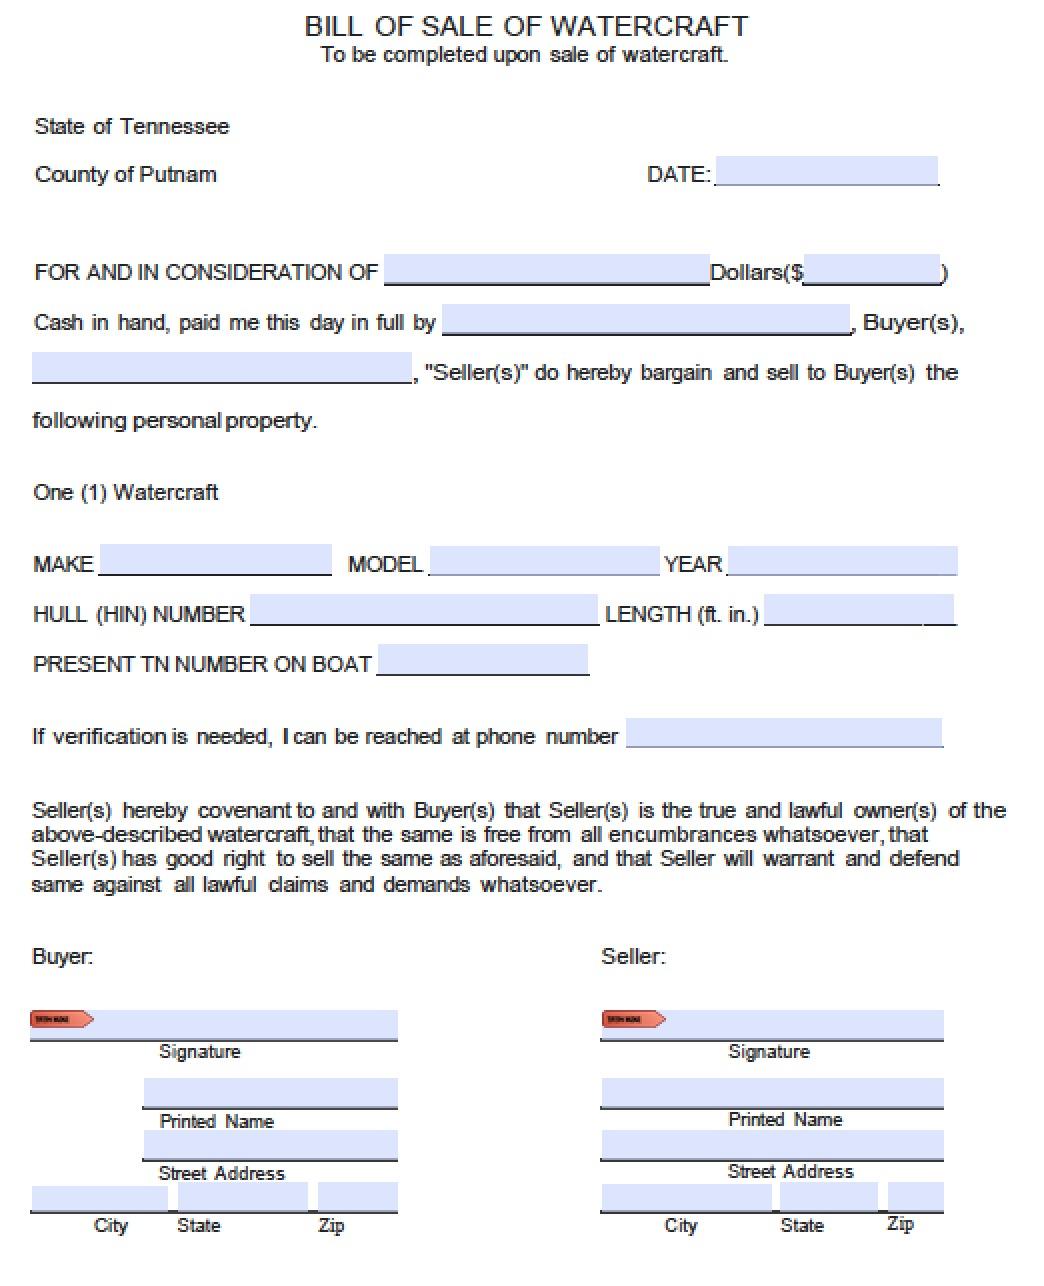 Bill Of Sale Form Boat Tn – Bill of Sale Word Document